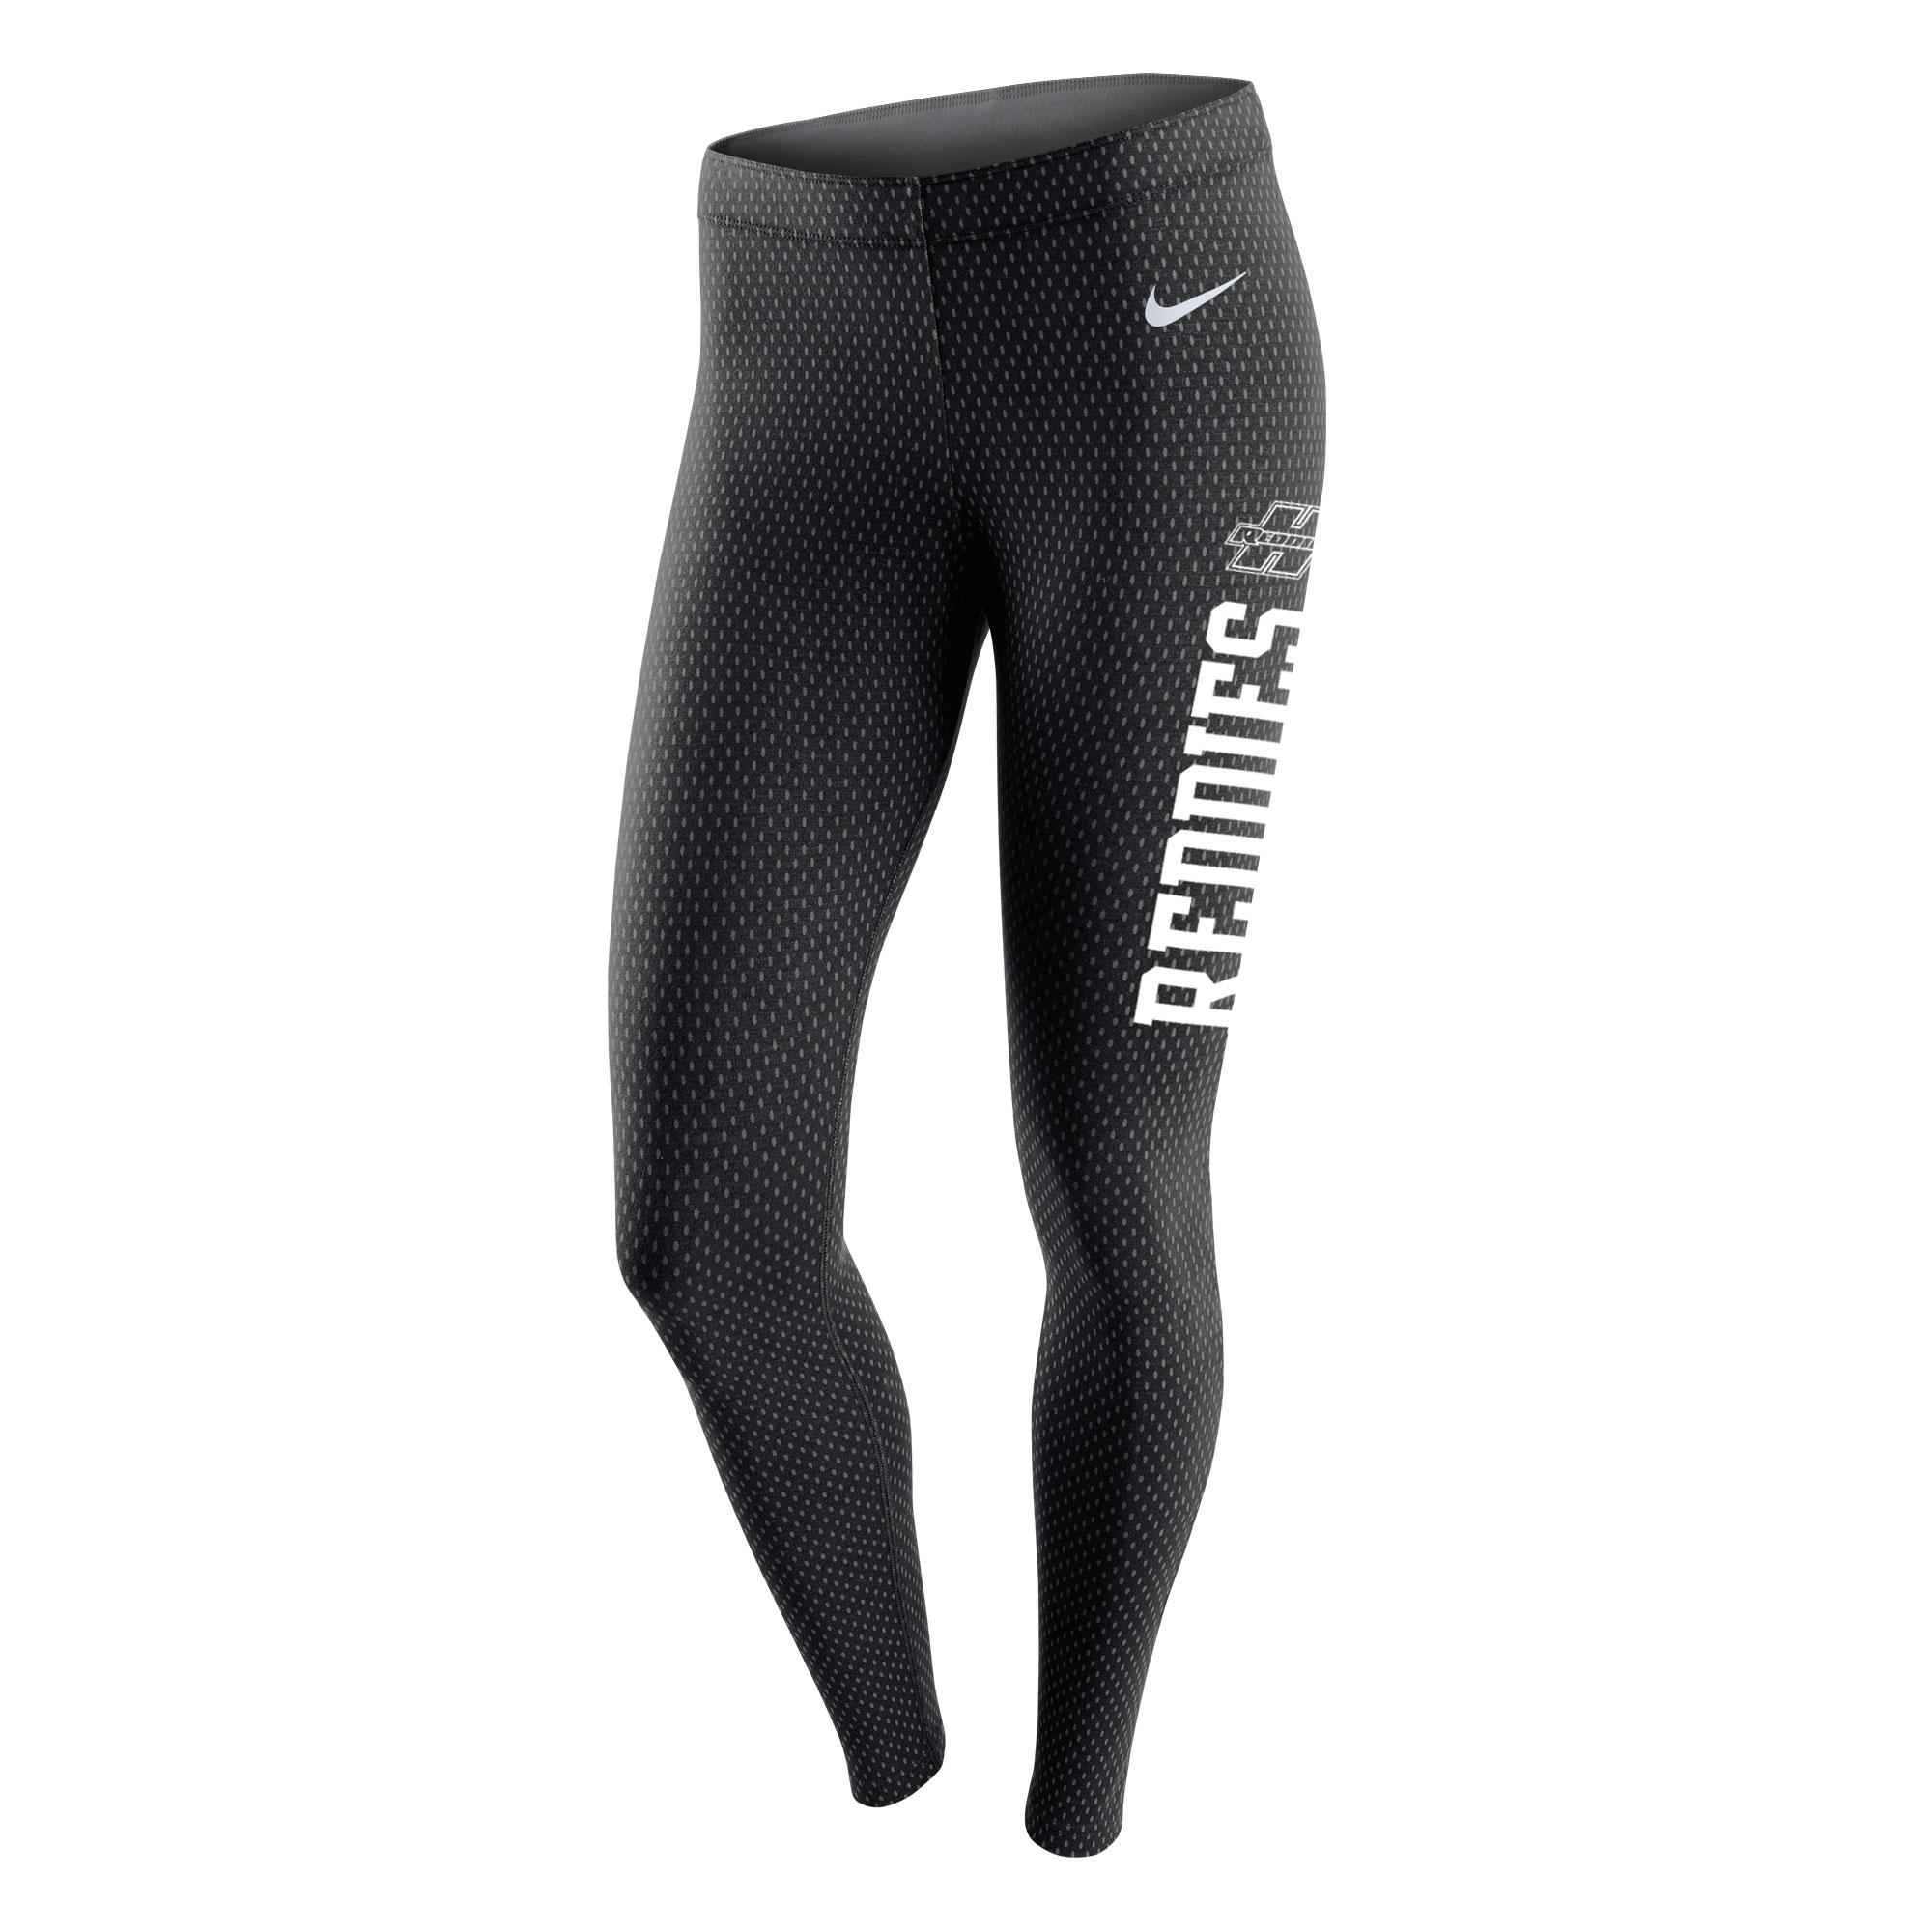 Nike Womens Tailgate Legging